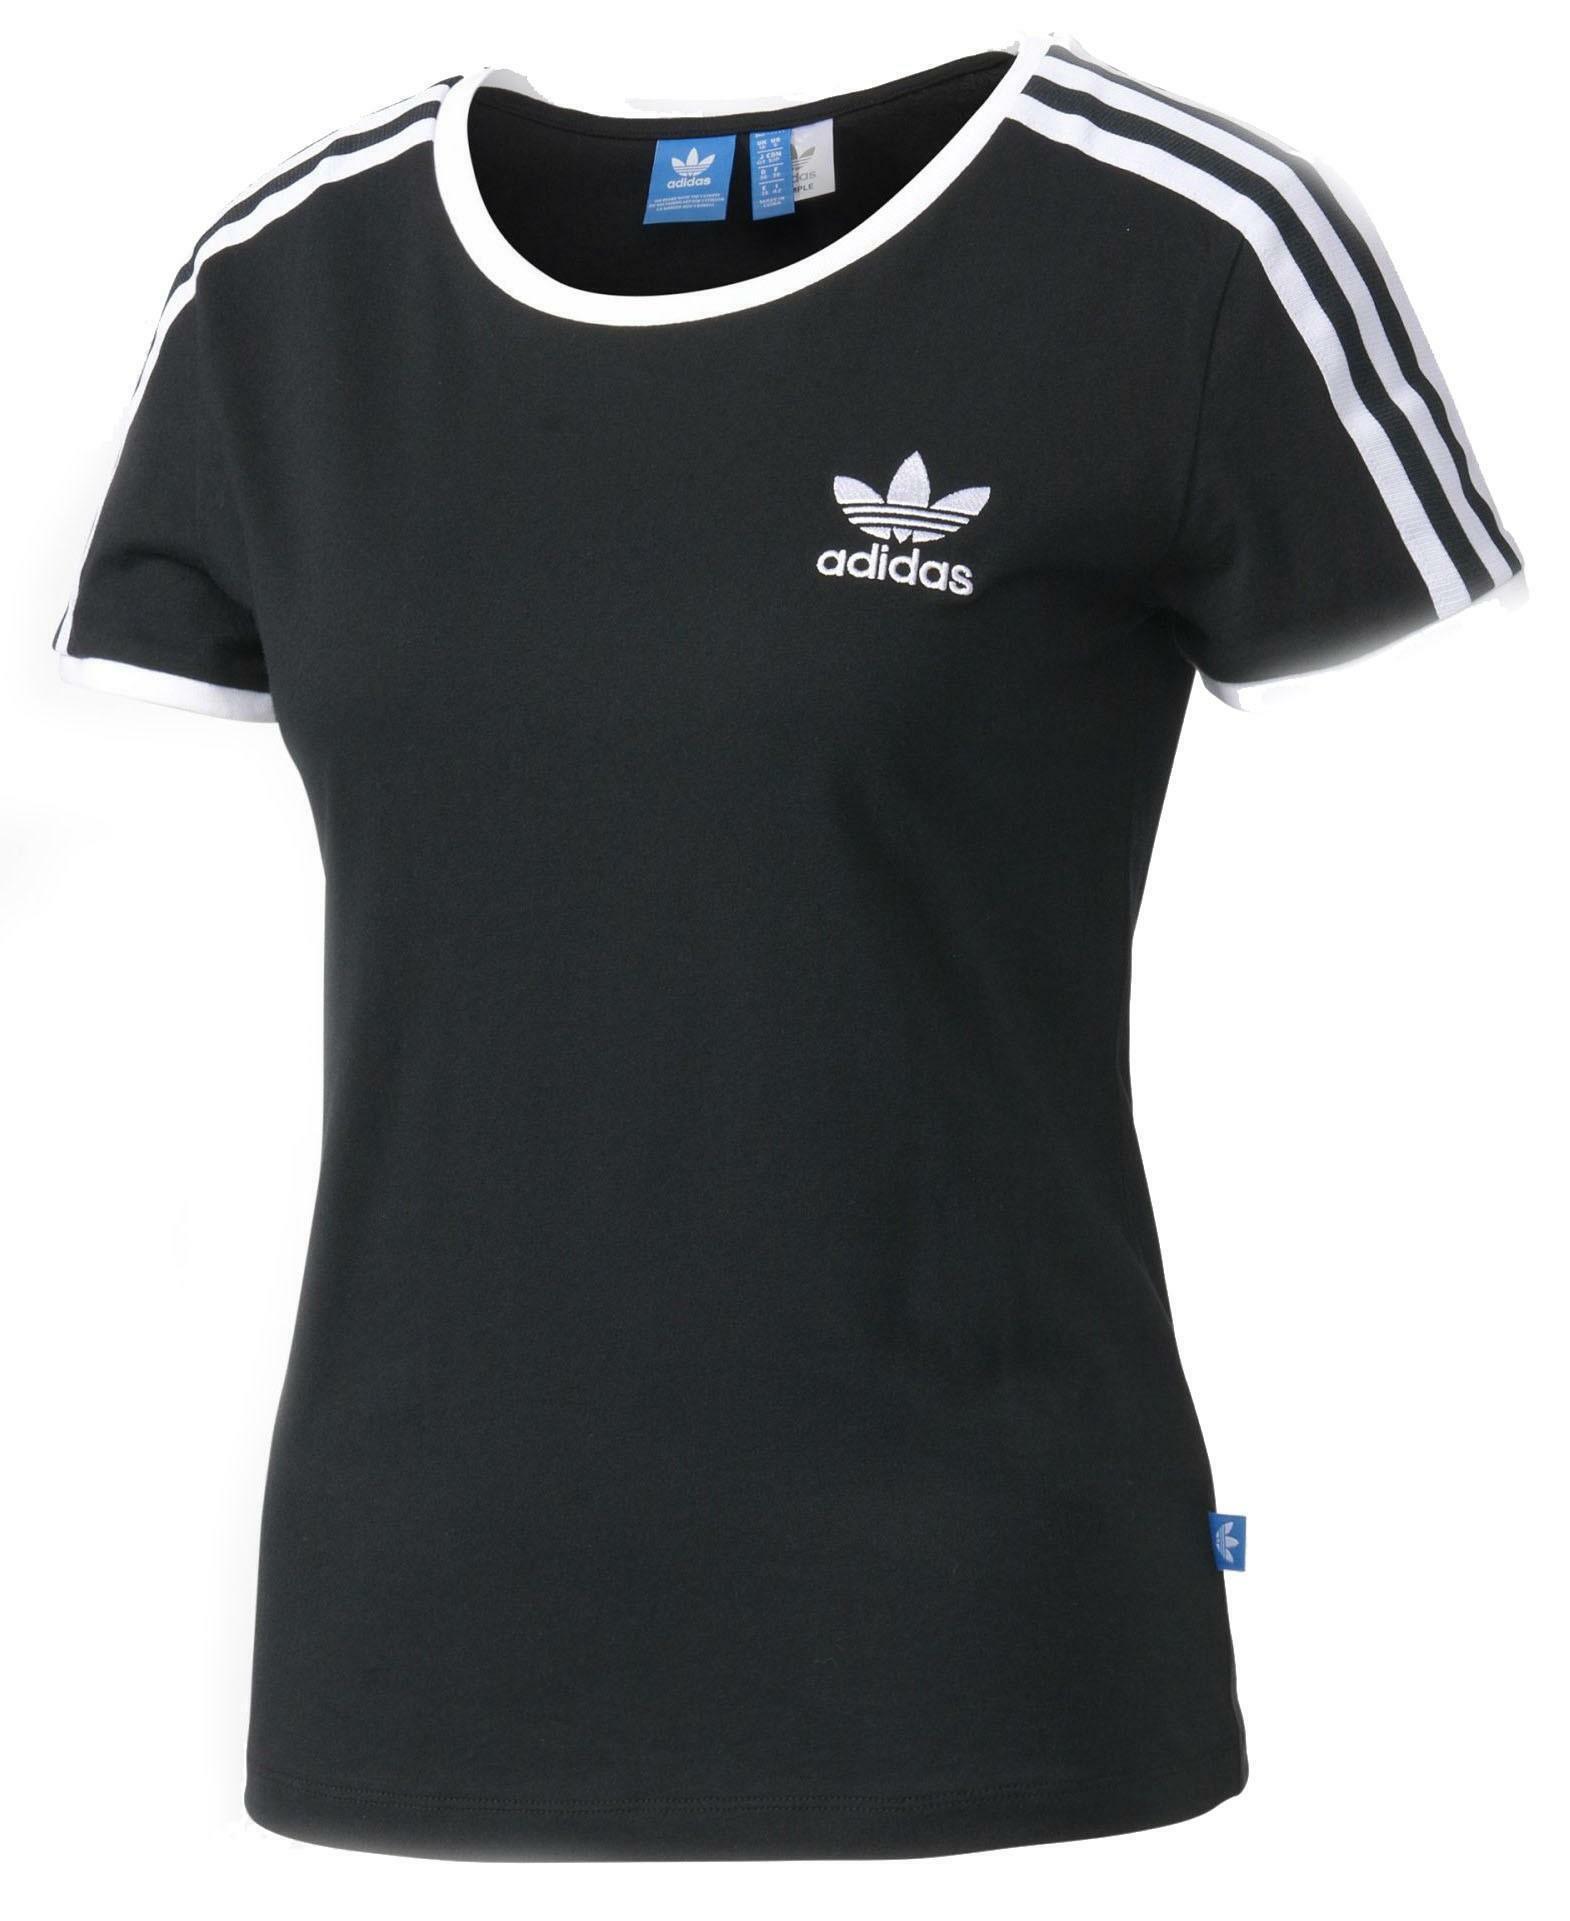 adidas adidas sandra 1977 t-shirt donna nera